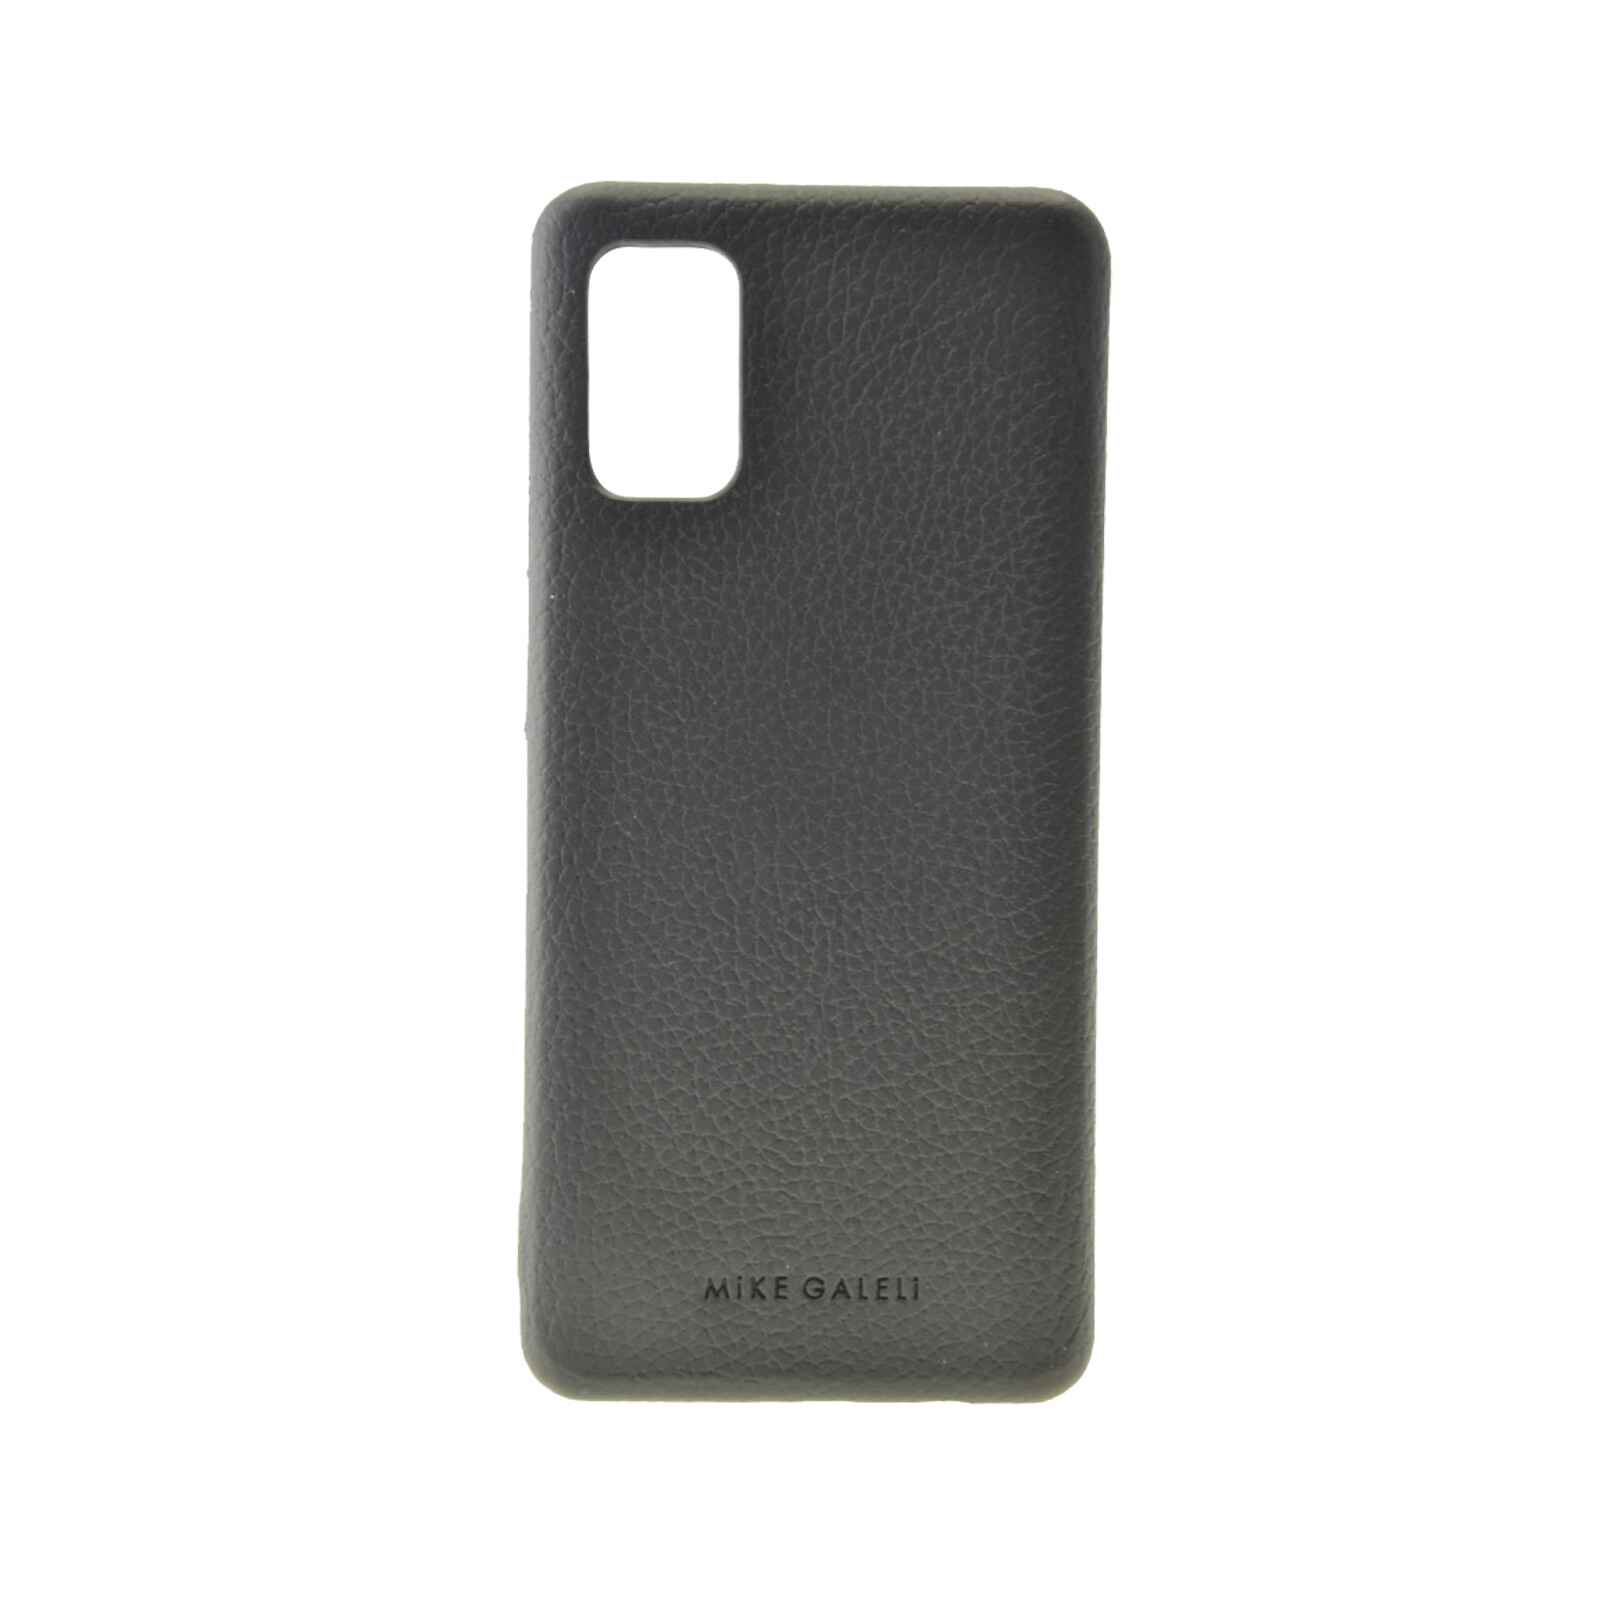 Galeli Backcover FINN Samsung Galaxy S20 Ultra schwarz